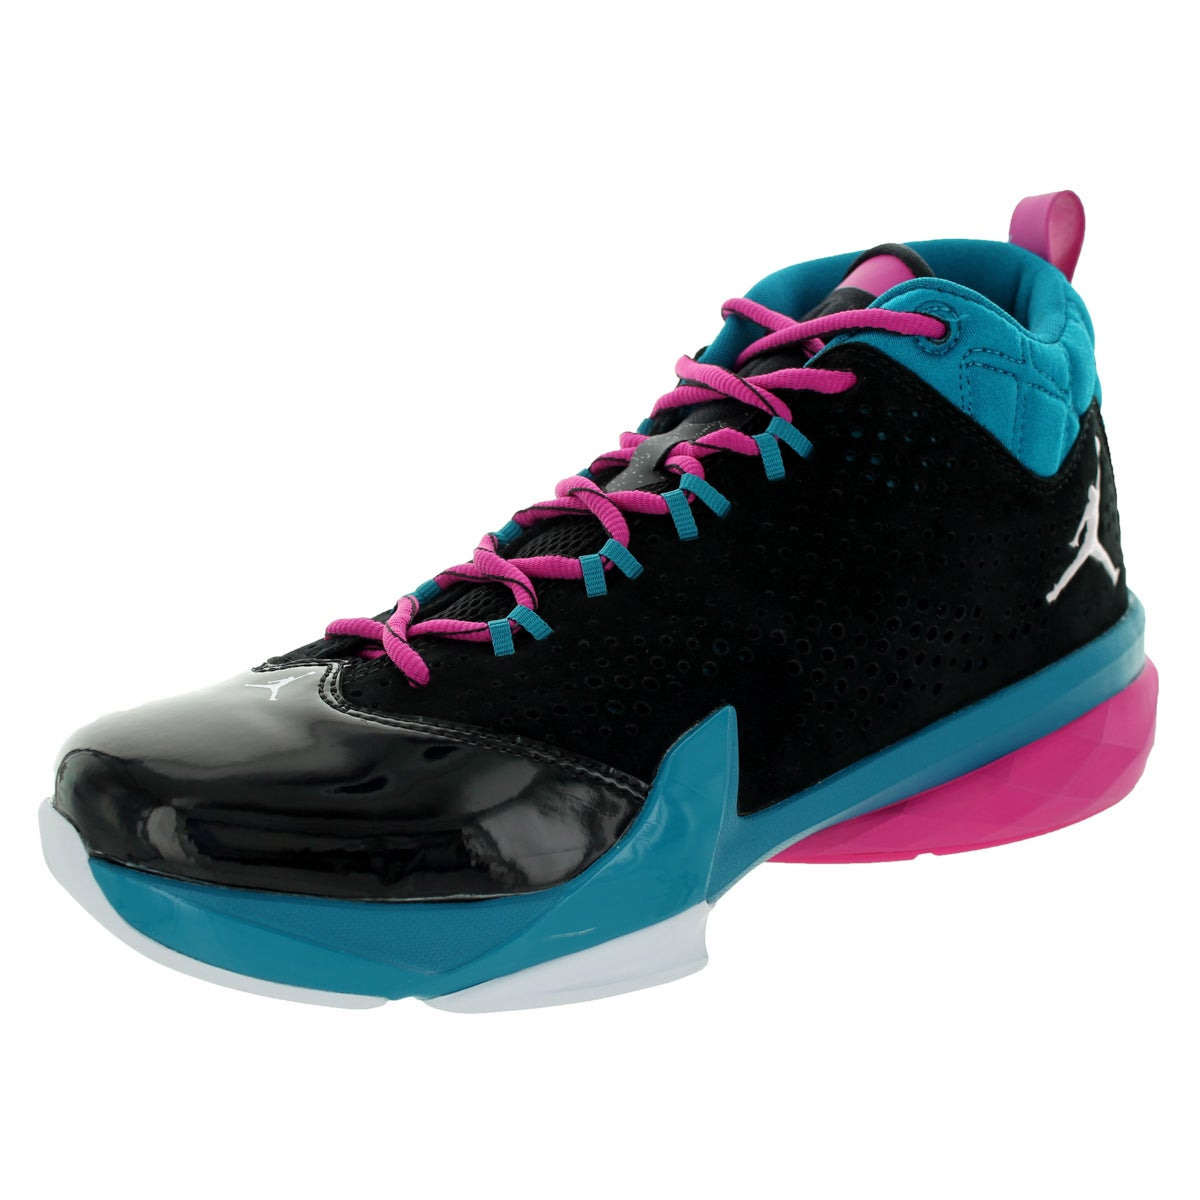 Nike Jordan Men's Jordan Flight Time 14.5 Black/White/Trp...